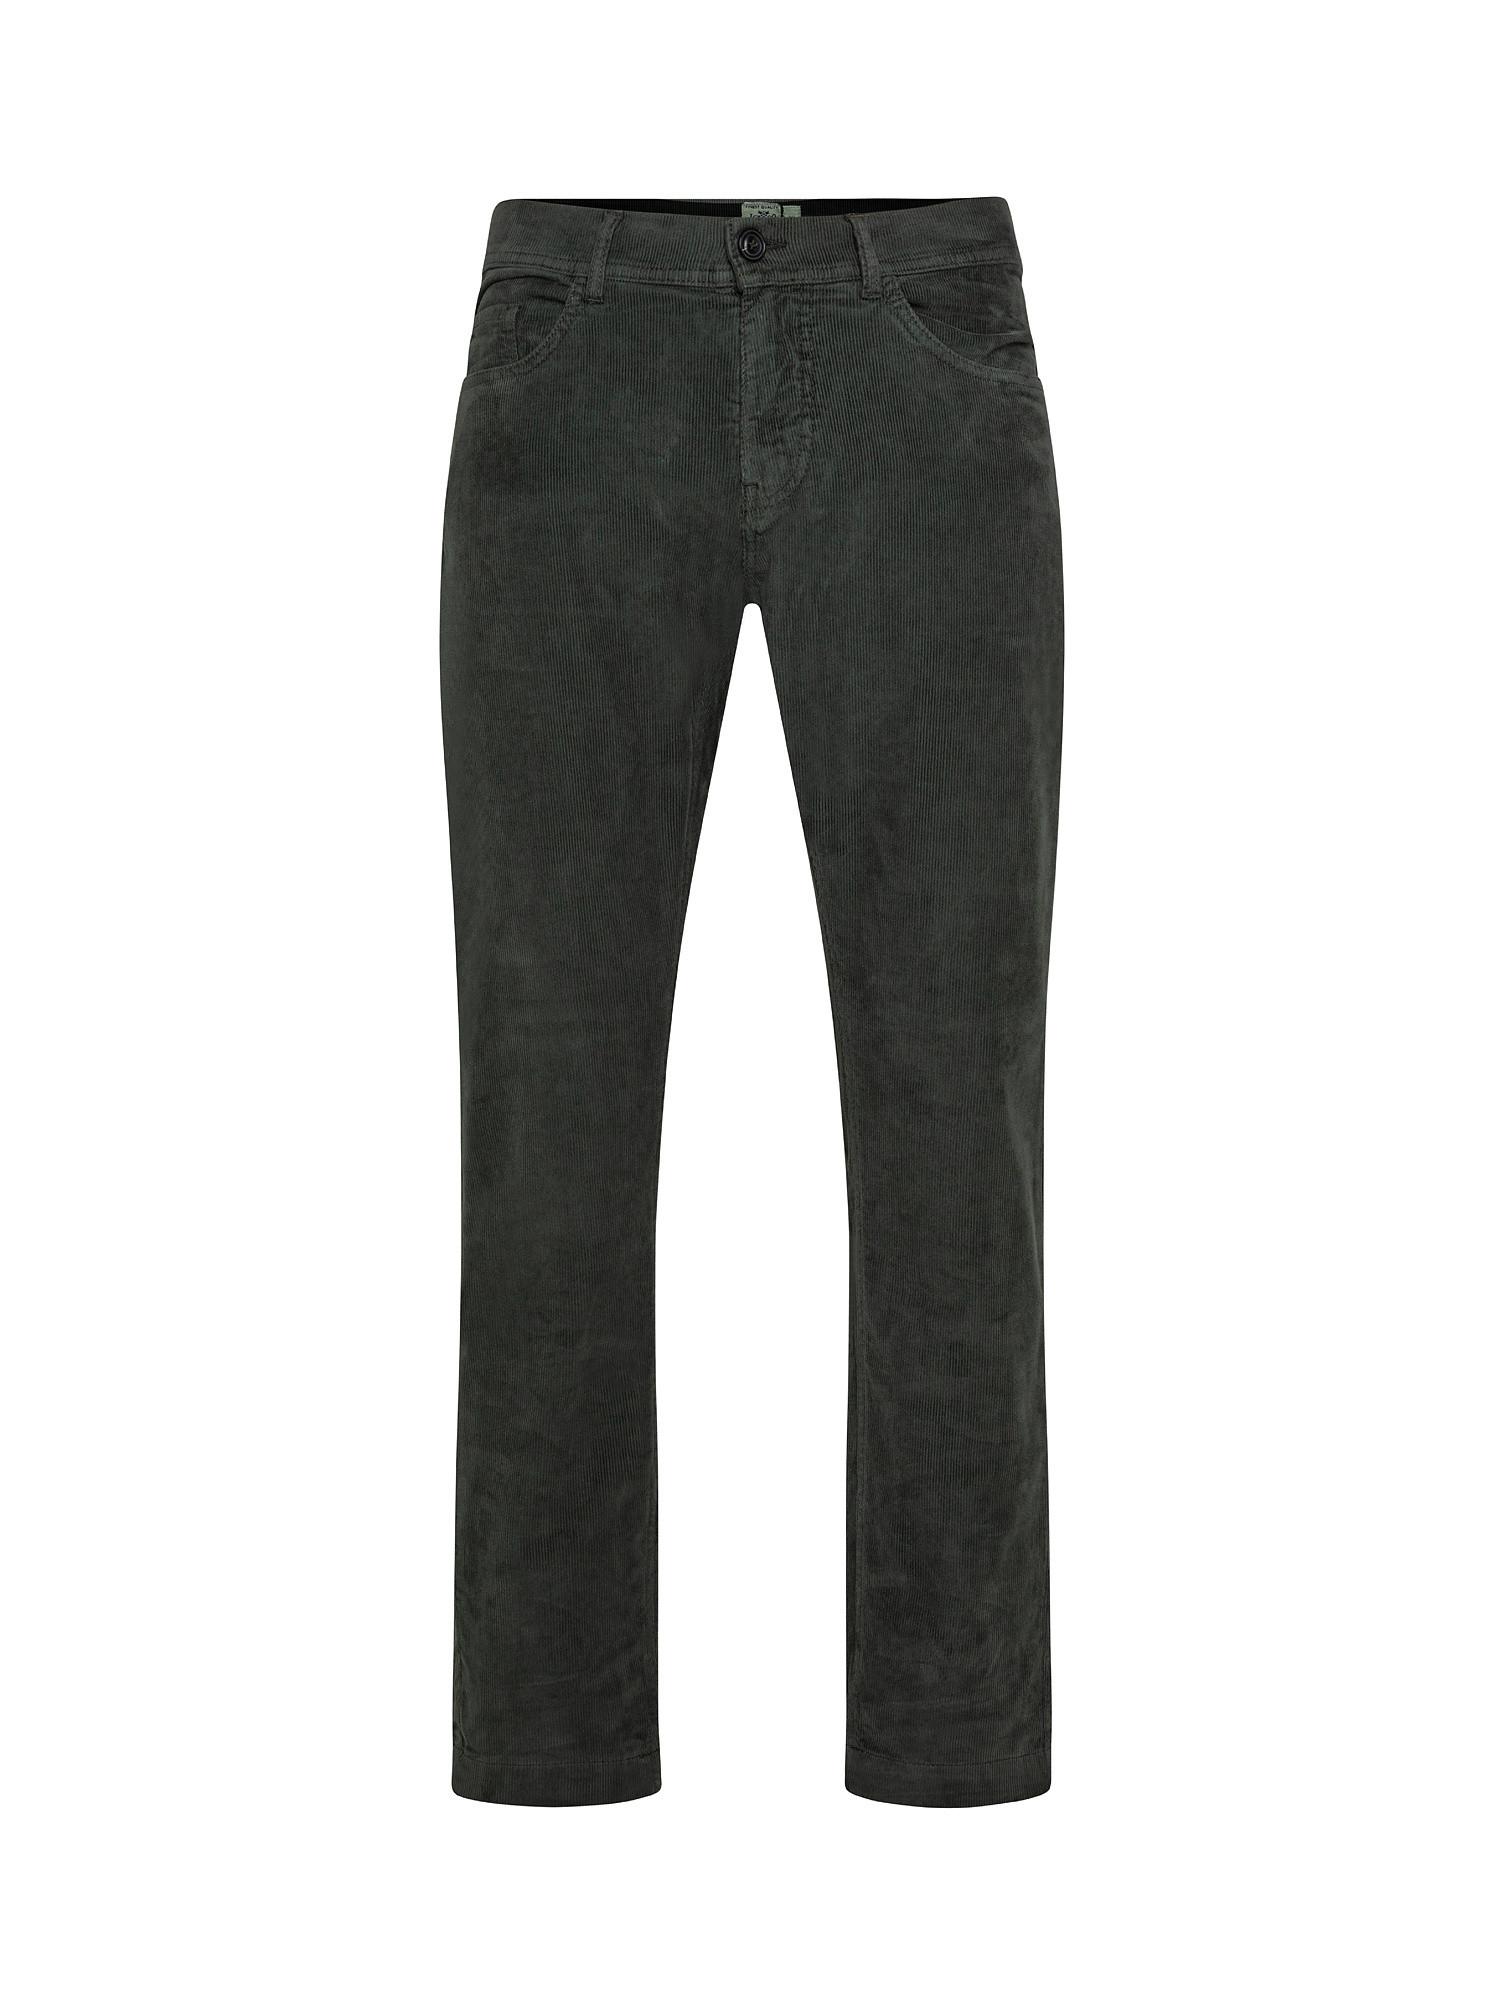 Pantalone 5 tasche, Nero, large image number 0